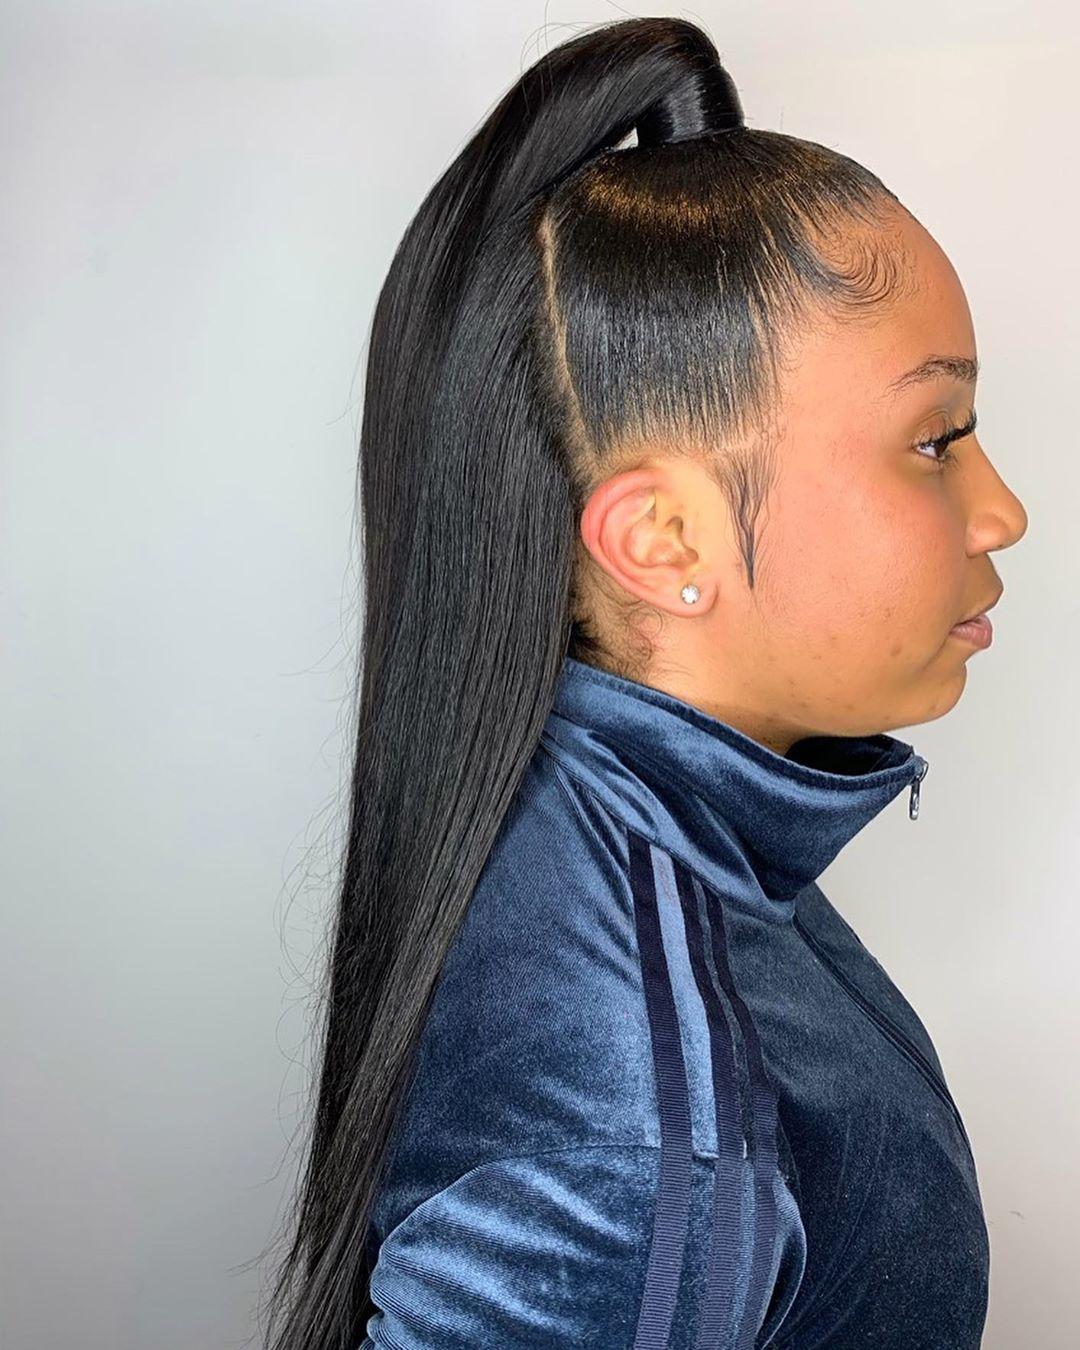 9+ Creative Ways To Make Black Sleek Ponytail Hairstyles in 9 ...